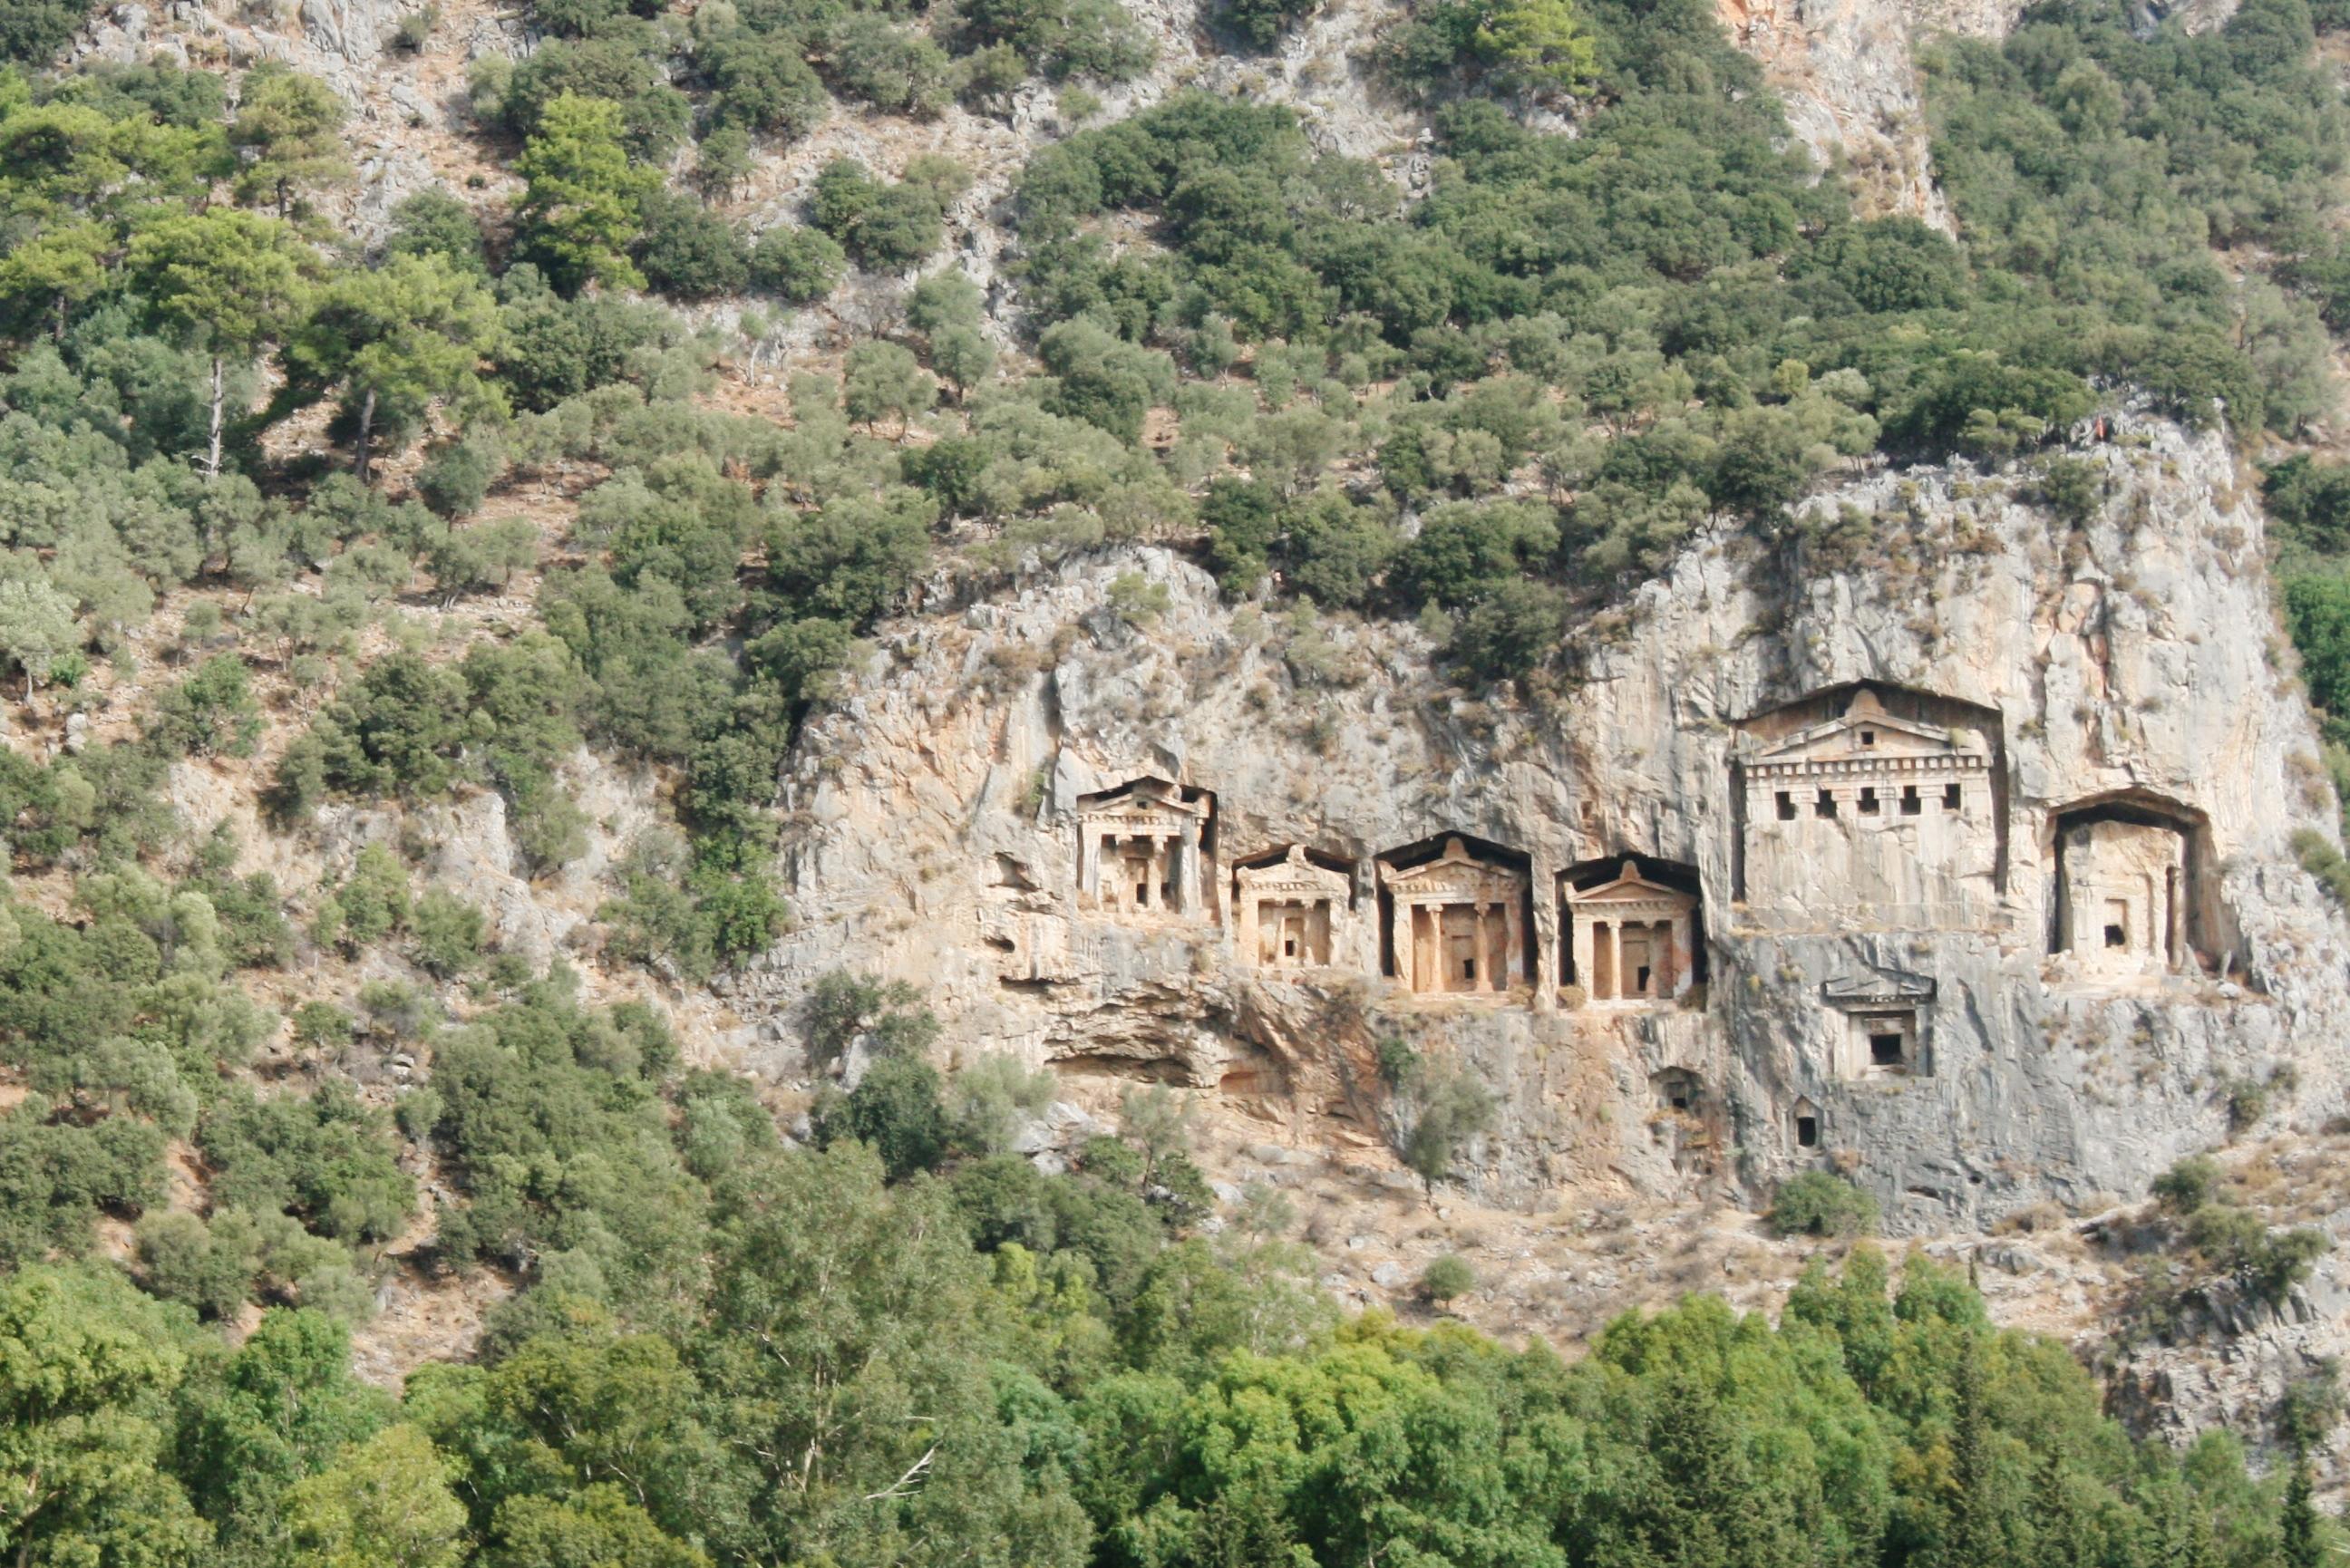 Rondreis Turkije Kaunos